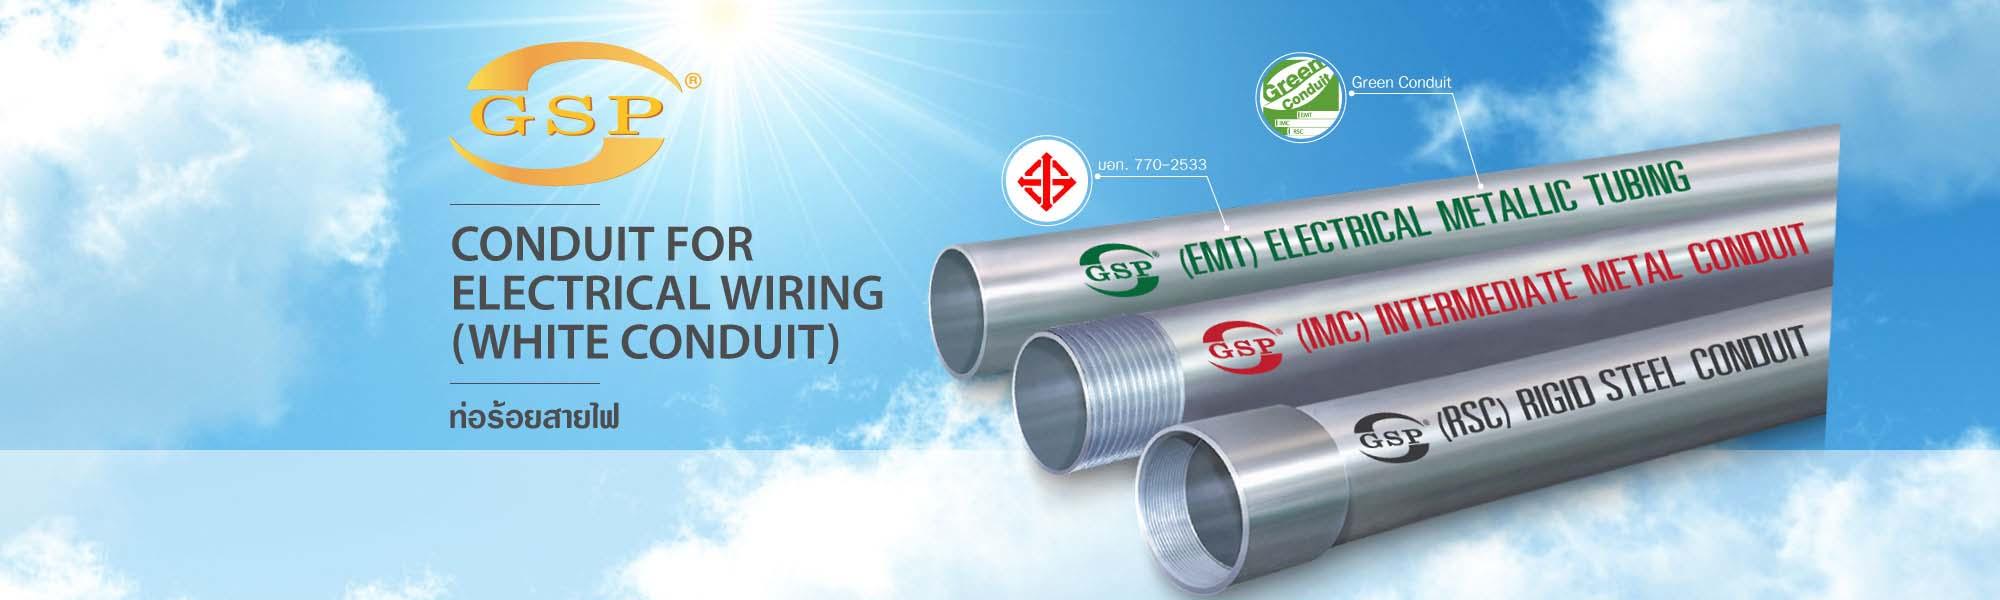 Home Emt Electrical Metal Tubing Conduit Galvanized Steel Pipe 0 2911 2970 8